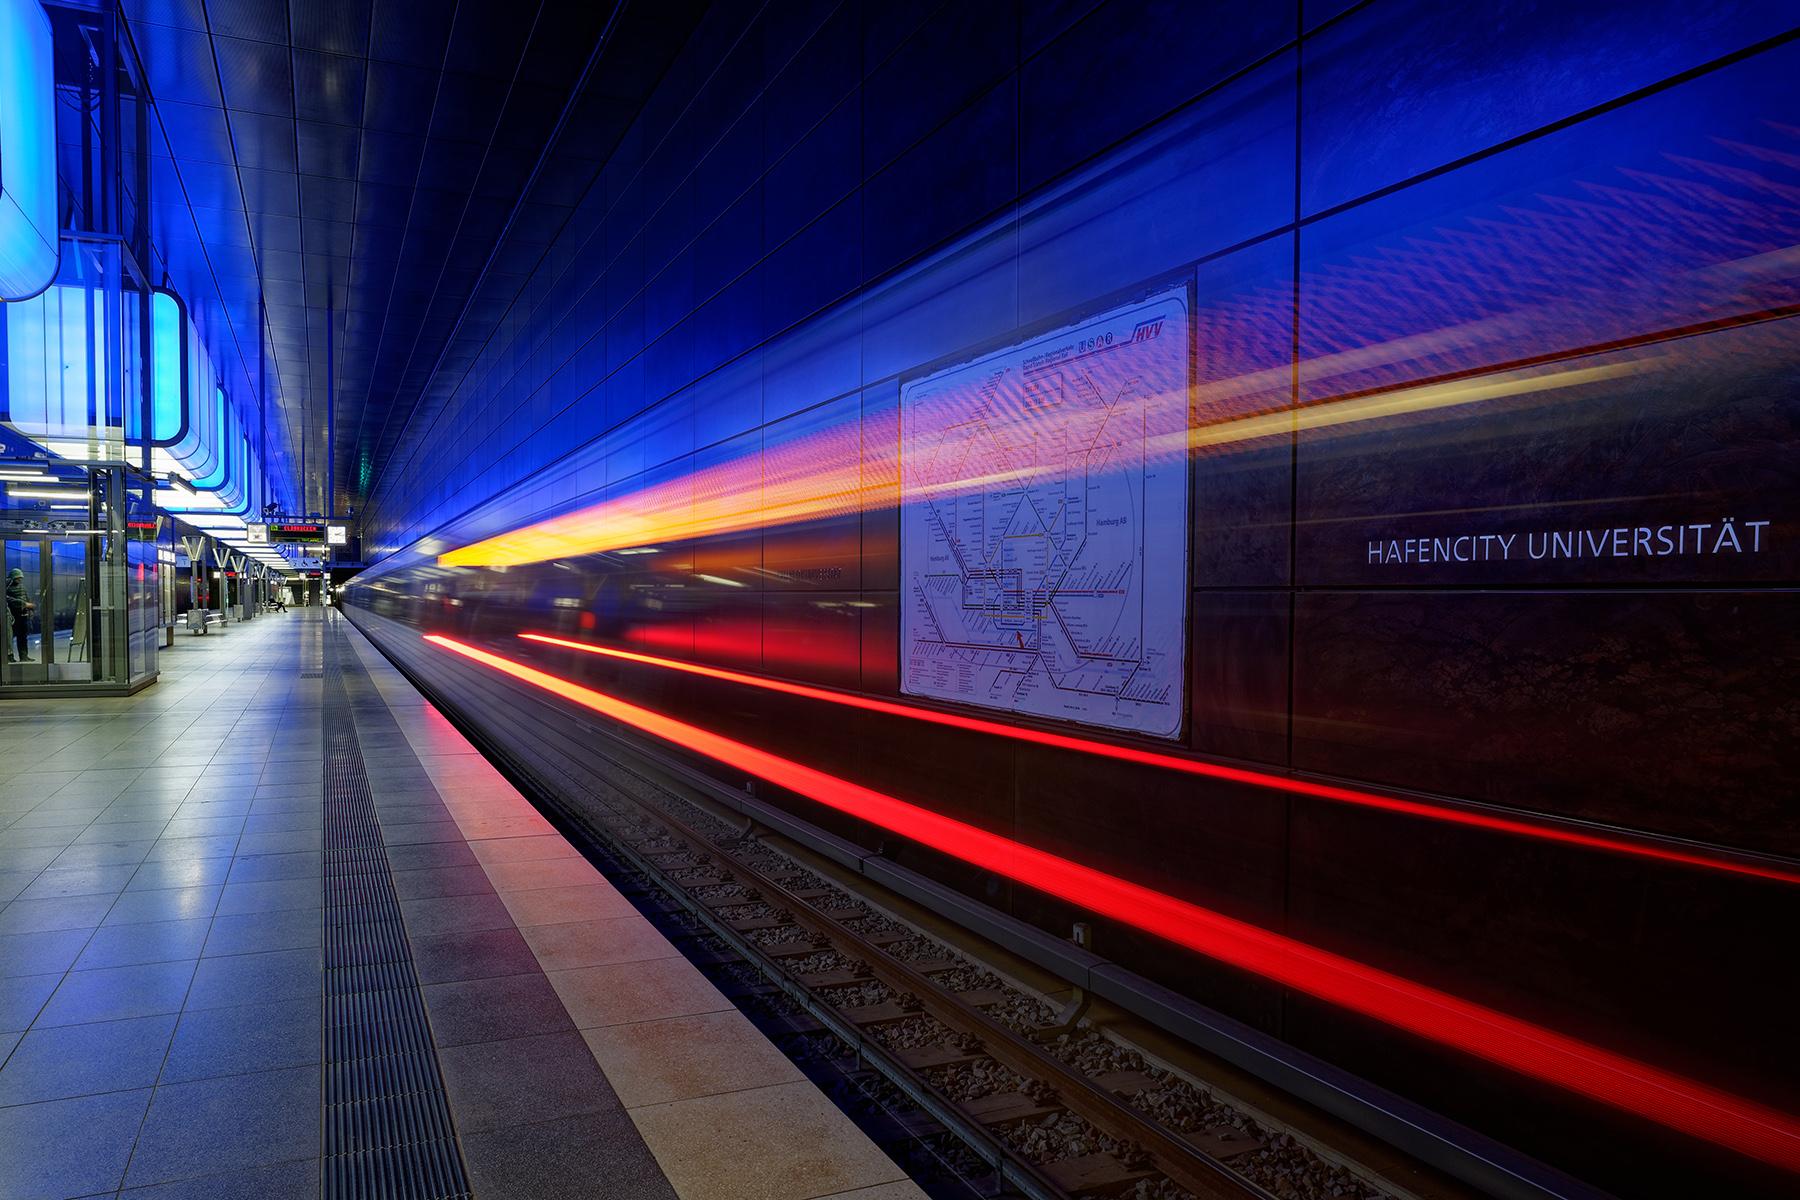 HafenCity Universität, the U-Bahn station near one of Hamburg's universities